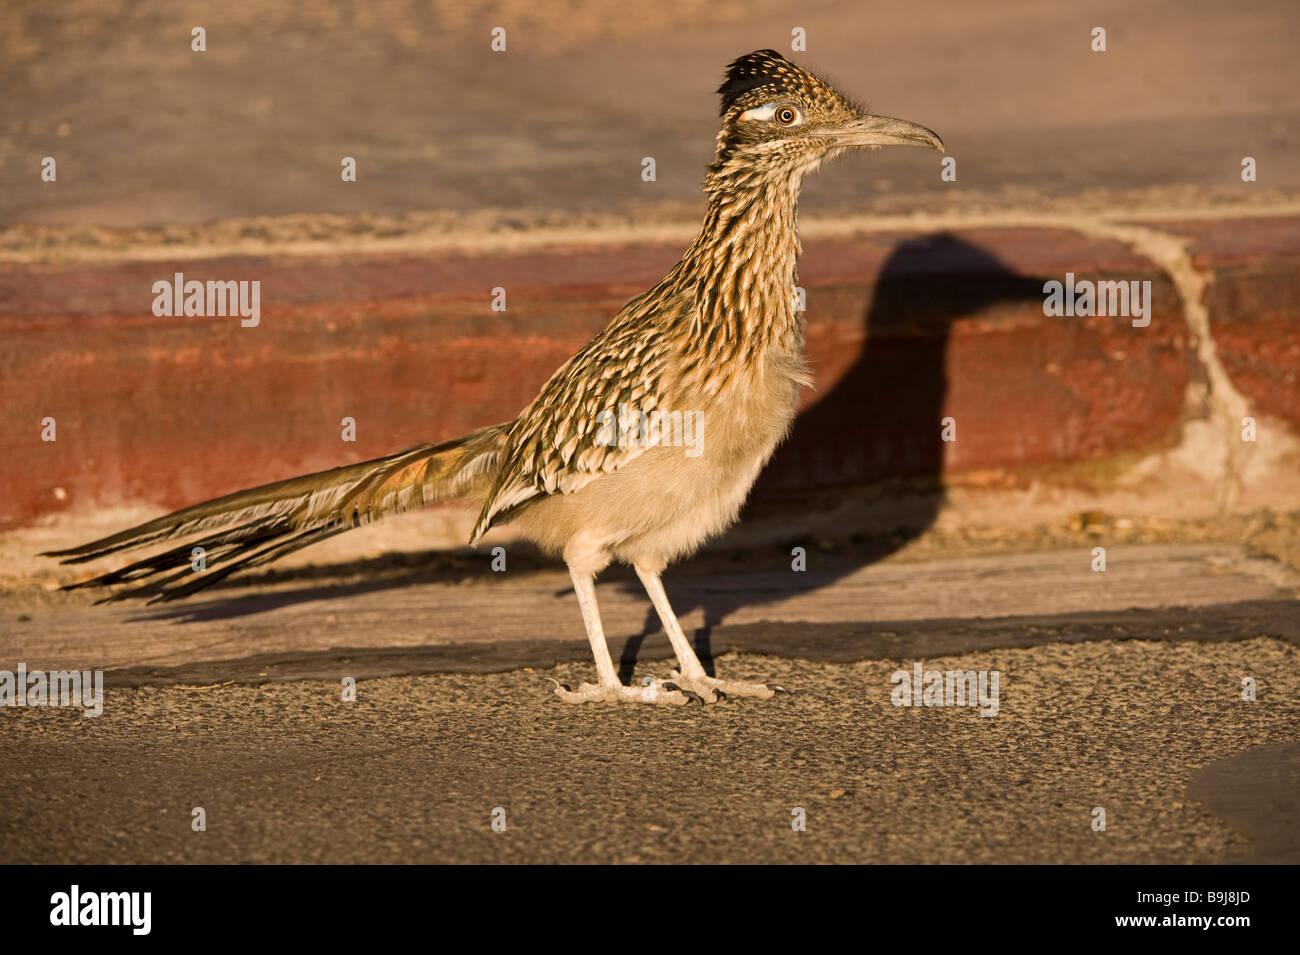 Greater Roadrunner (Geococcyx californianus), Death Valley, California, USA - Stock Image